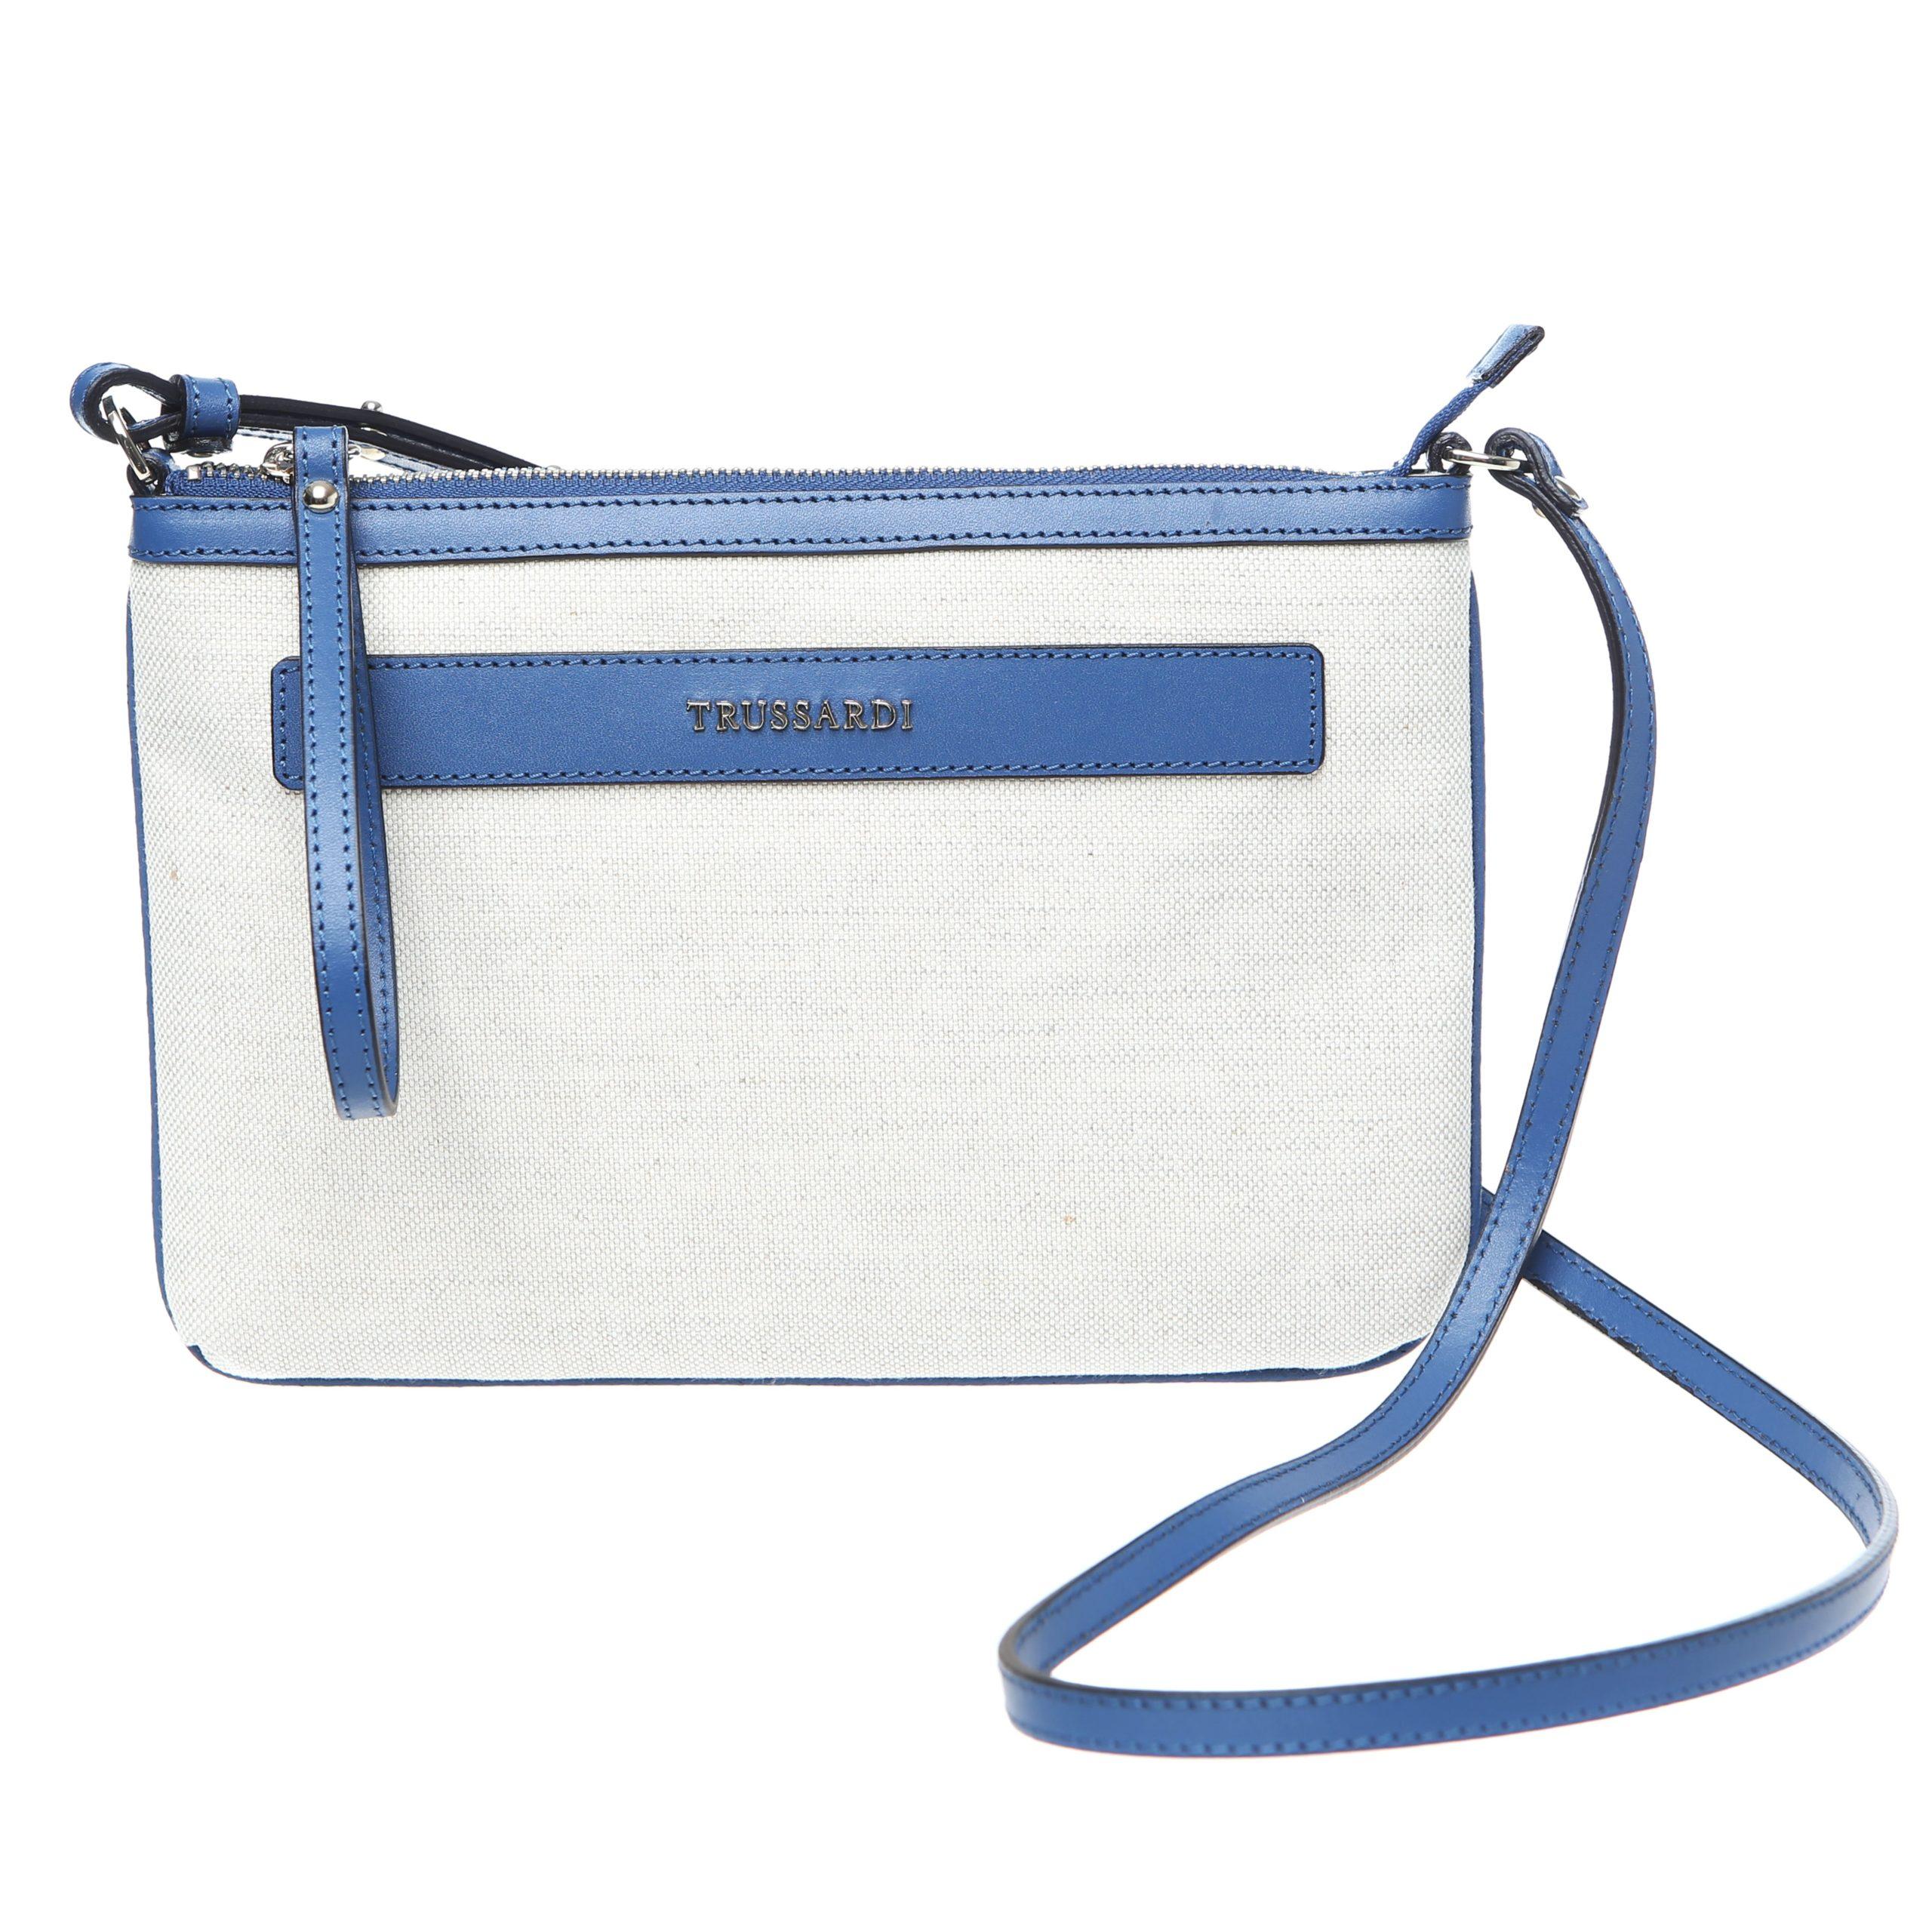 Trussardi Women's Crossbody Bag White 76B121M_128Natural-Blue